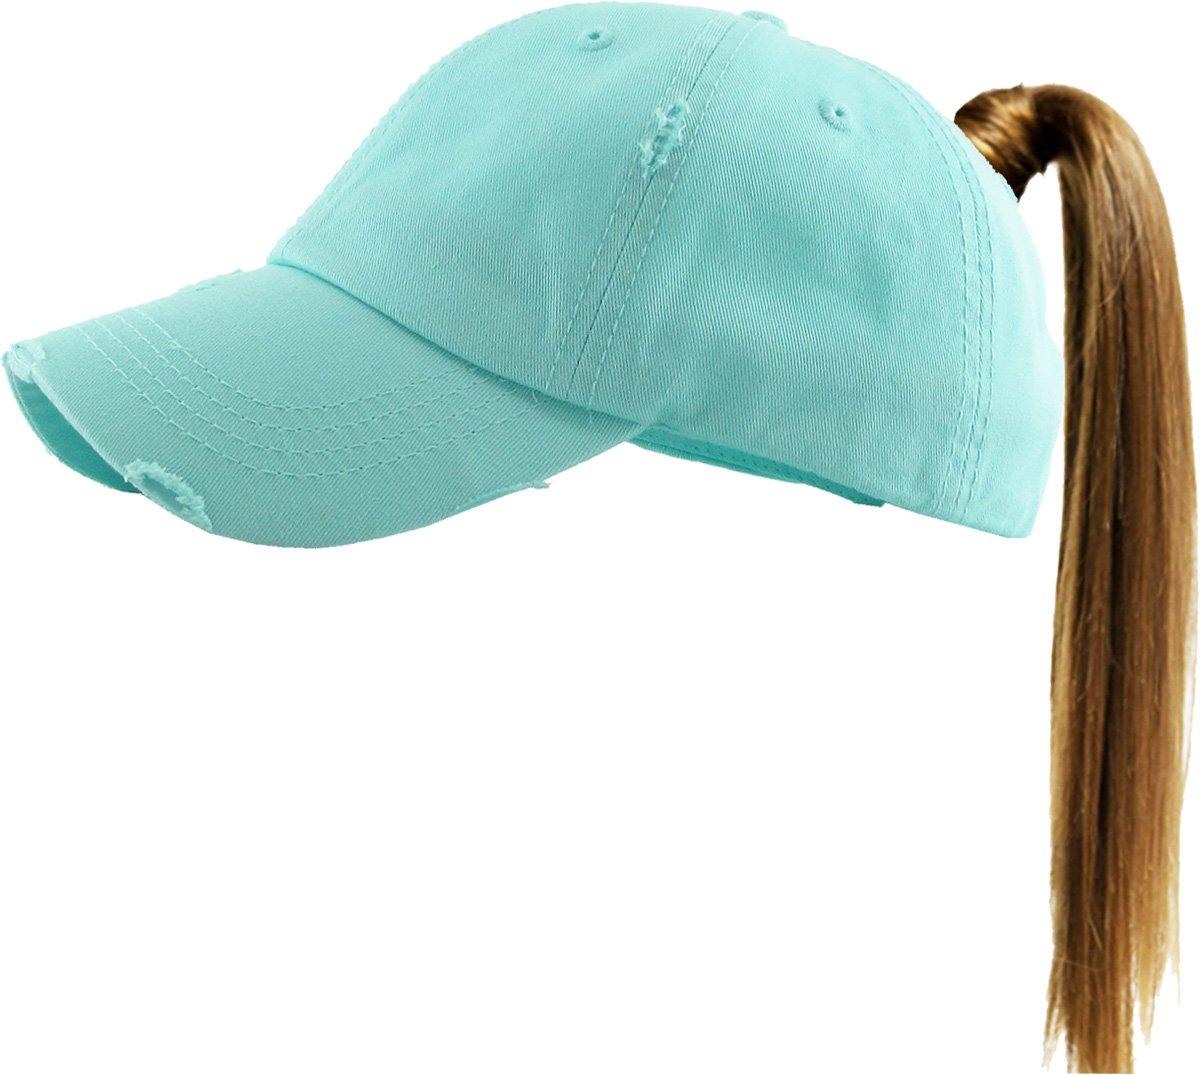 KBETHOS PONY-001 DBL Ponytail Messy High Bun Headwear Adjustable Cotton Trucker Mesh Hat Baseball Cap